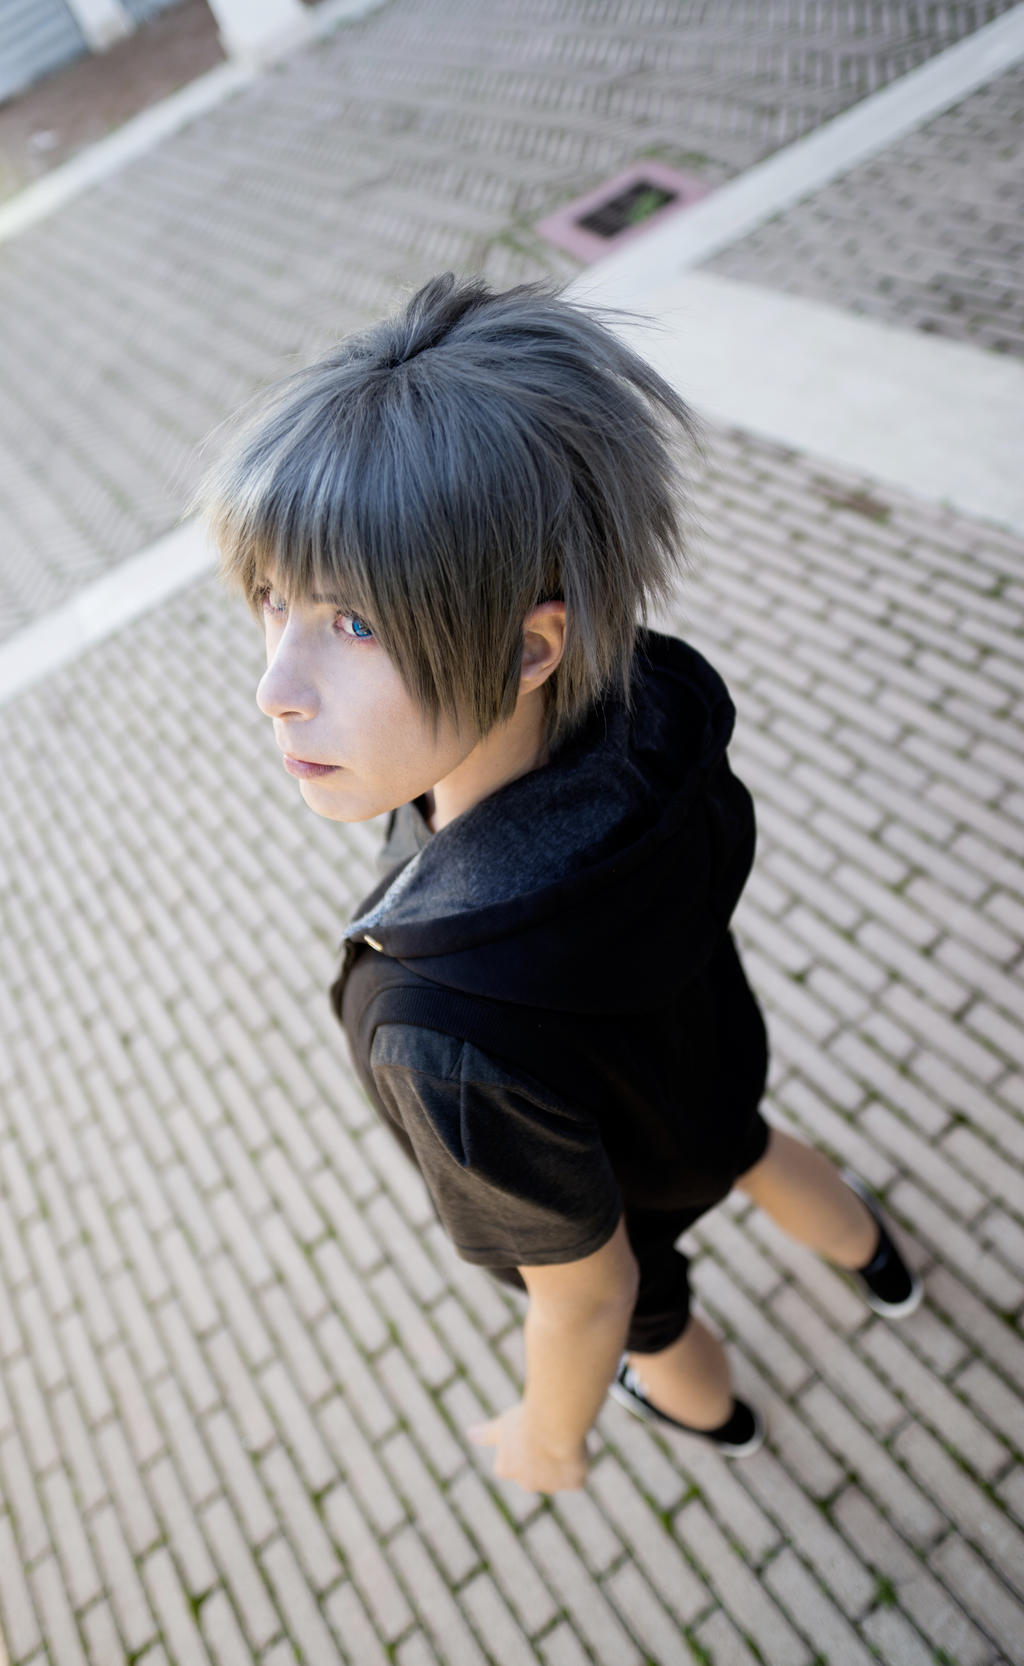 FF XV: Noctis by Smexy-Boy